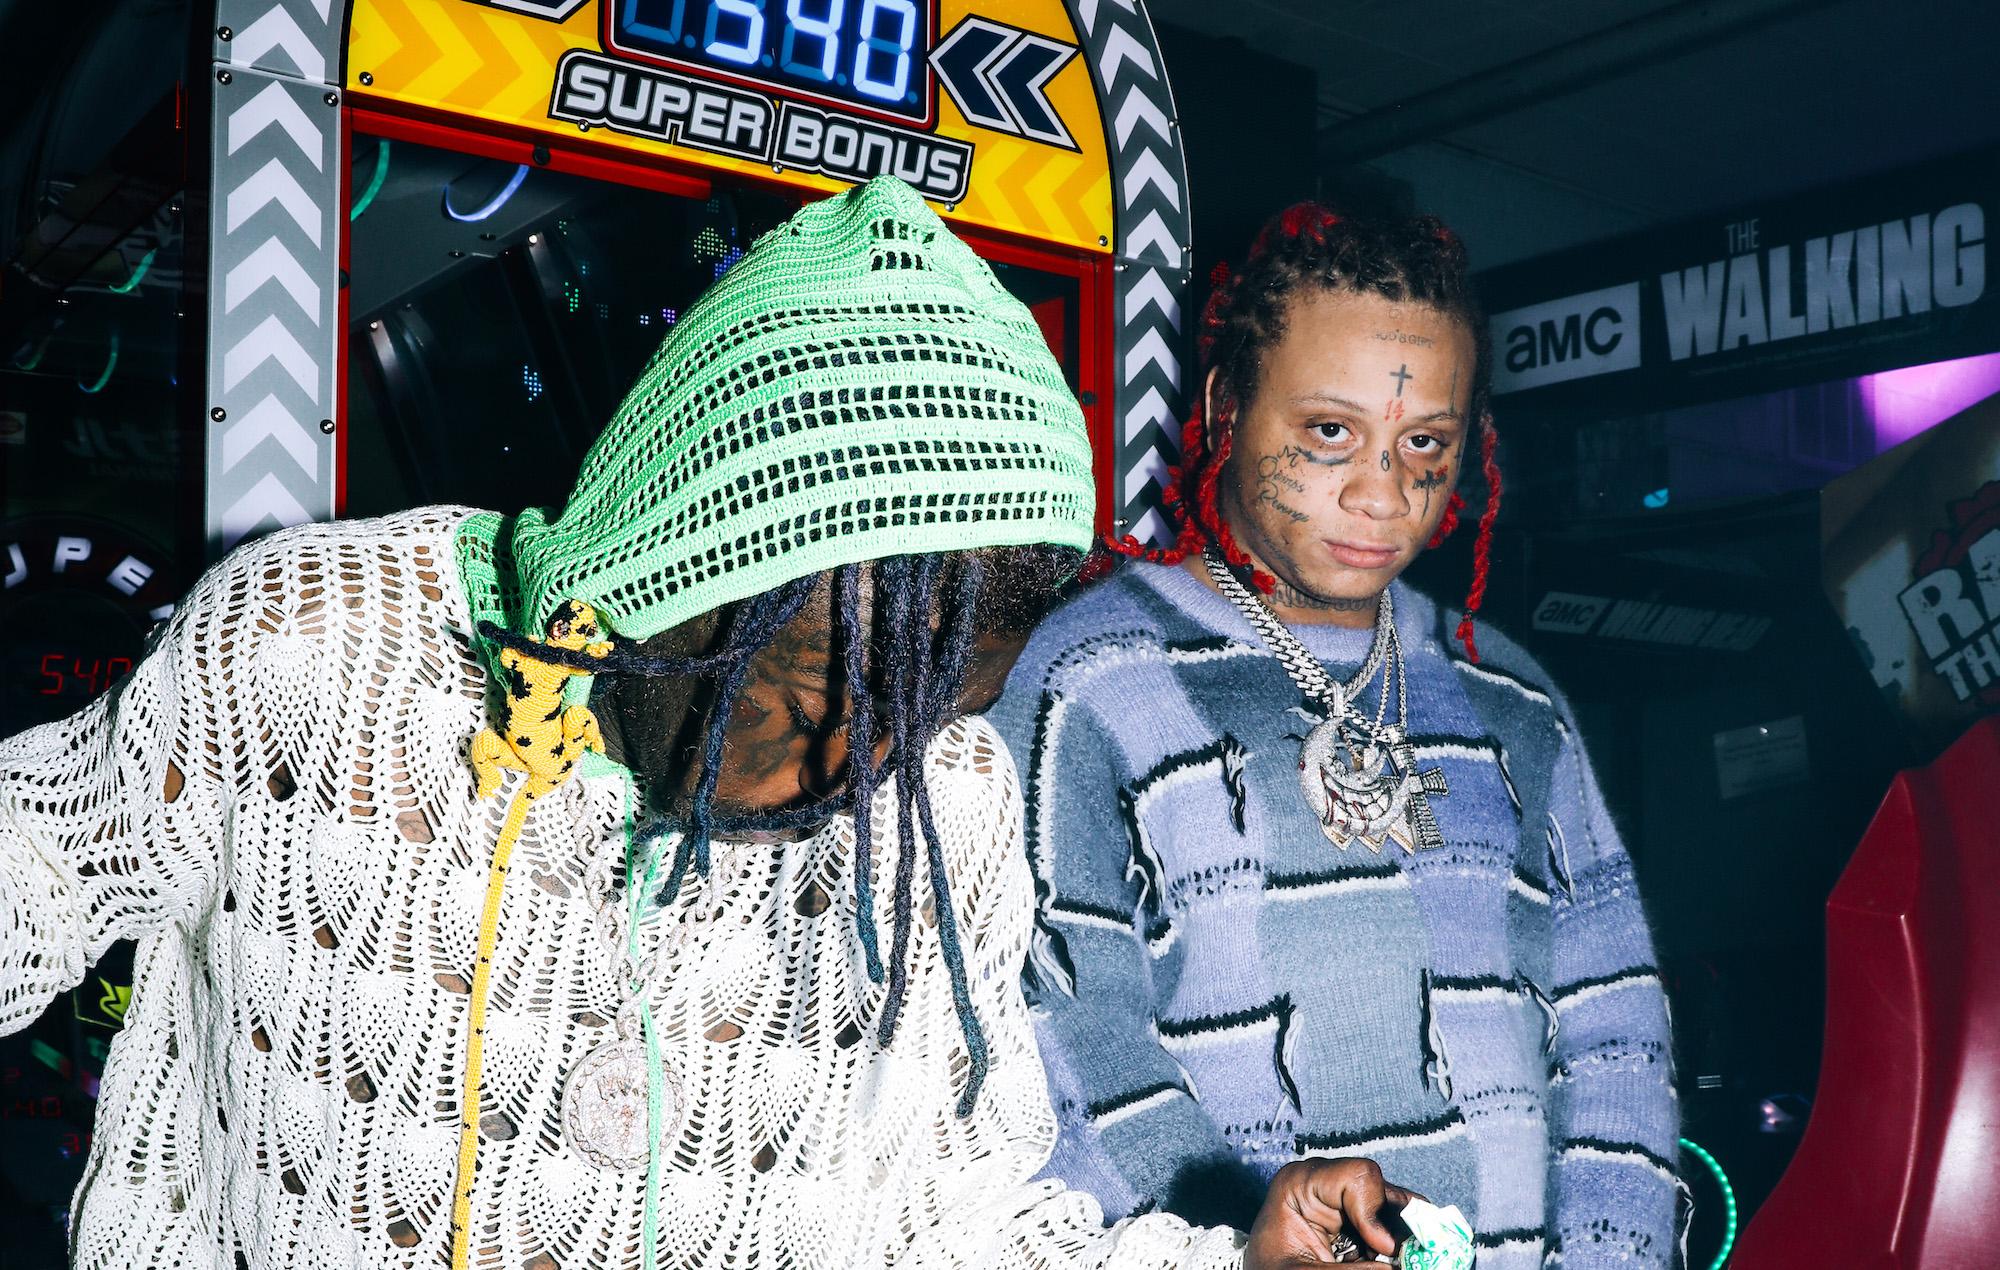 Trippie Redd links up with Lil Uzi Vert for poppy new single 'Holy Smokes'